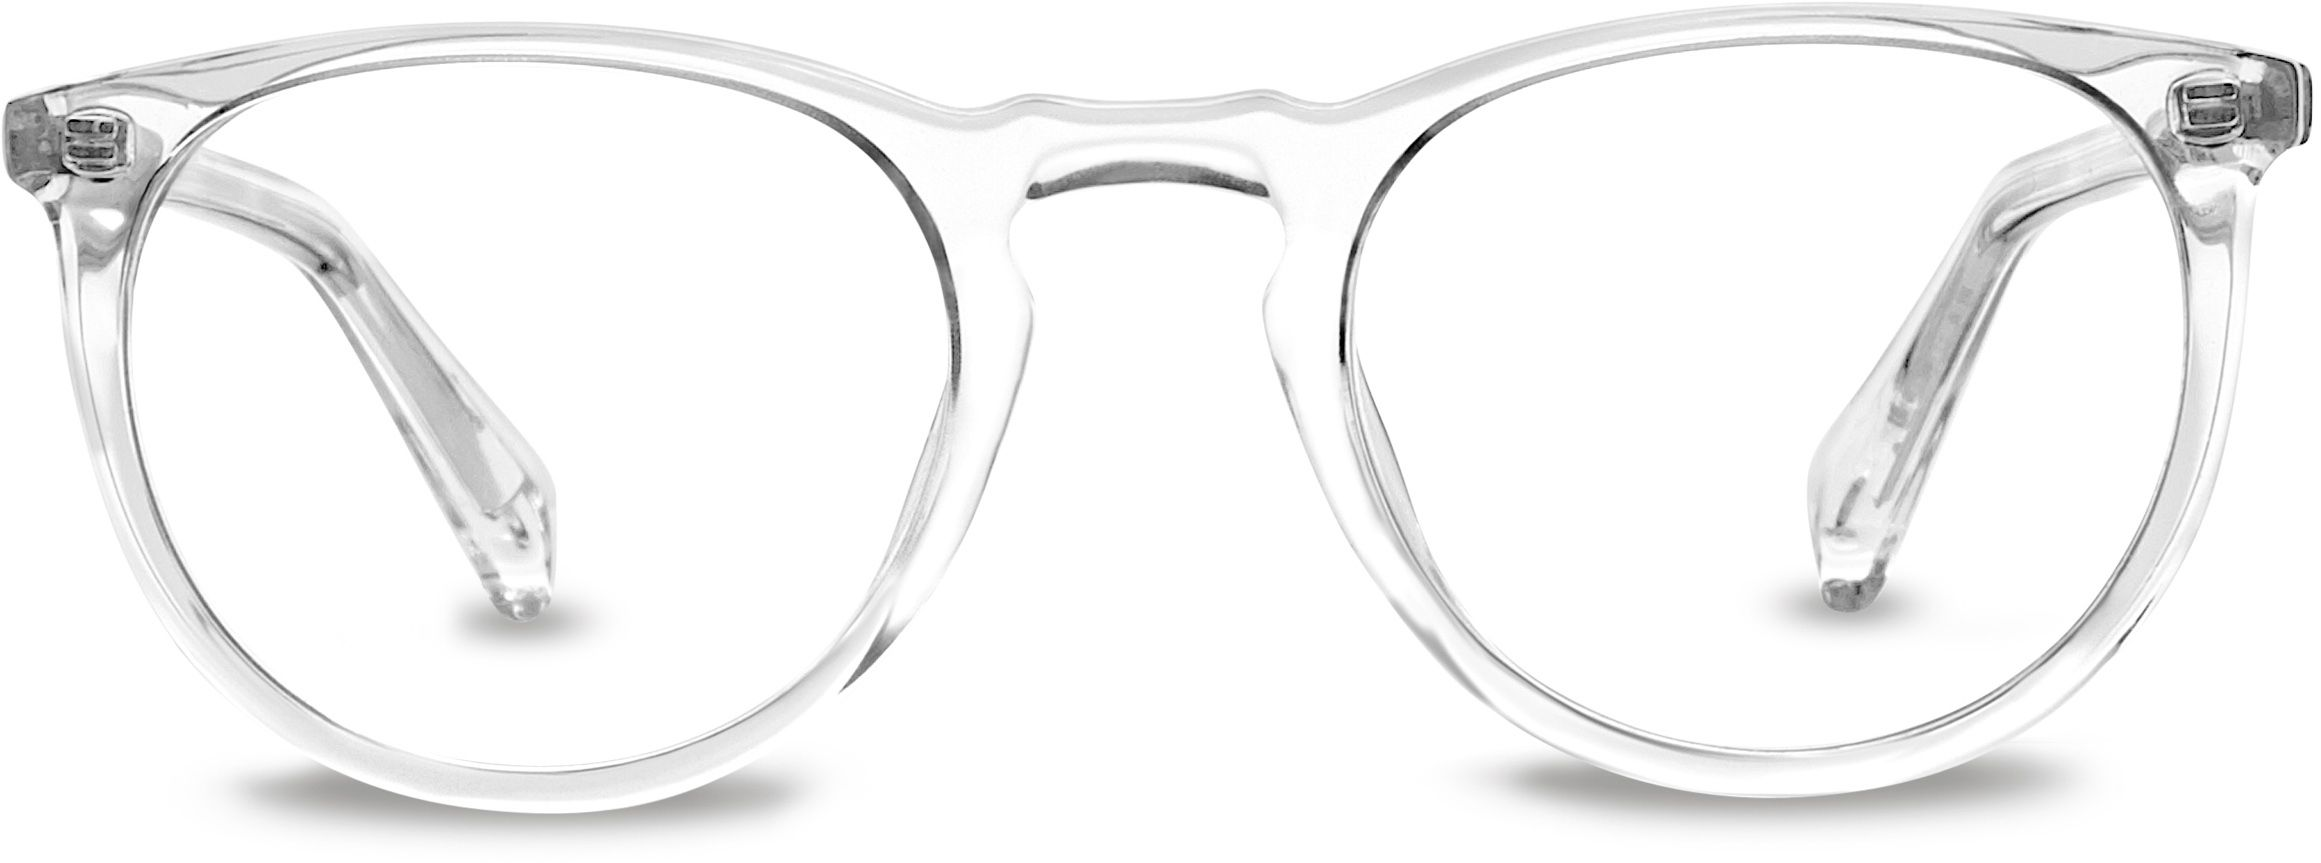 bf94cf30da Haskell Eyeglasses in Crystal for Women